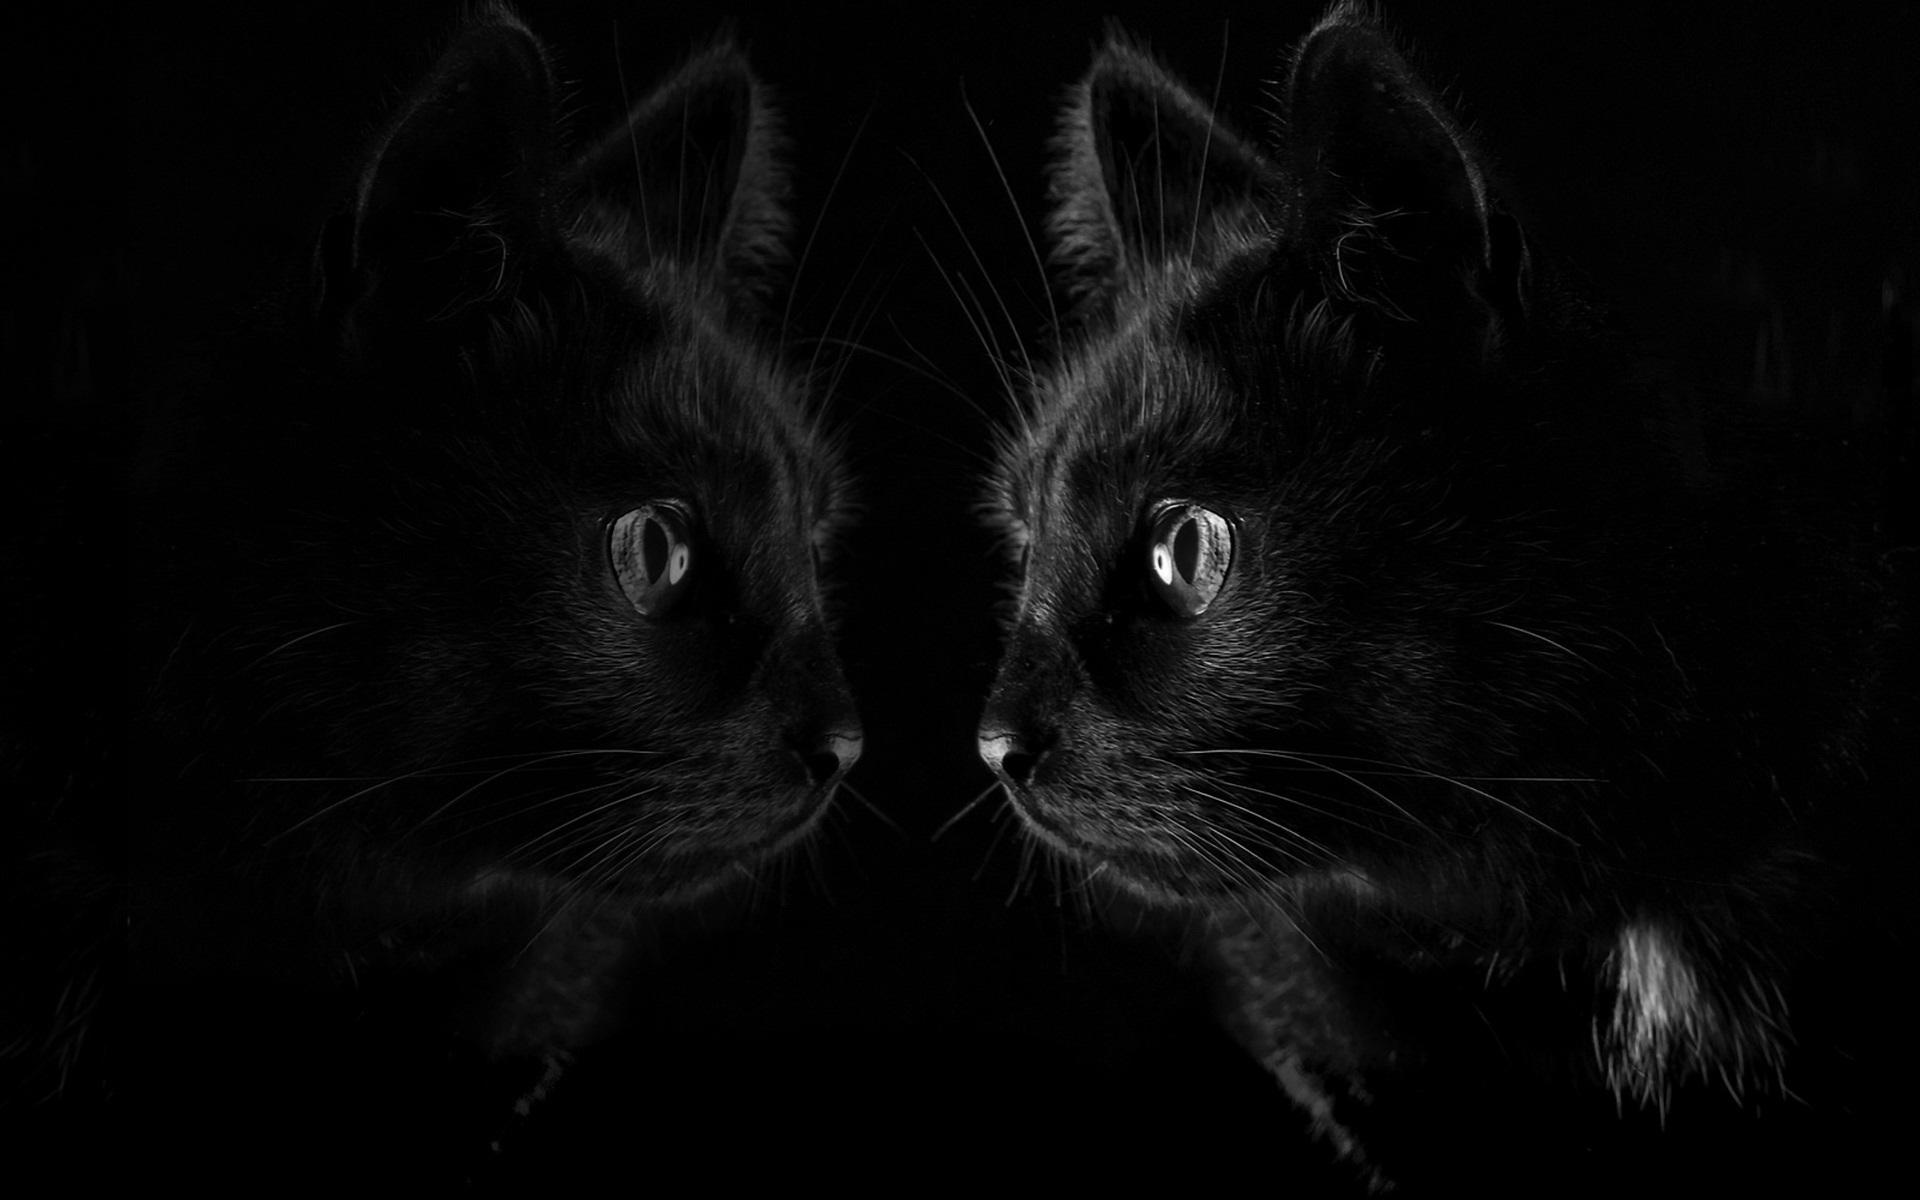 Fonds d'écran Chat noir regarder miroir, fond noir 1920x1200 HD image